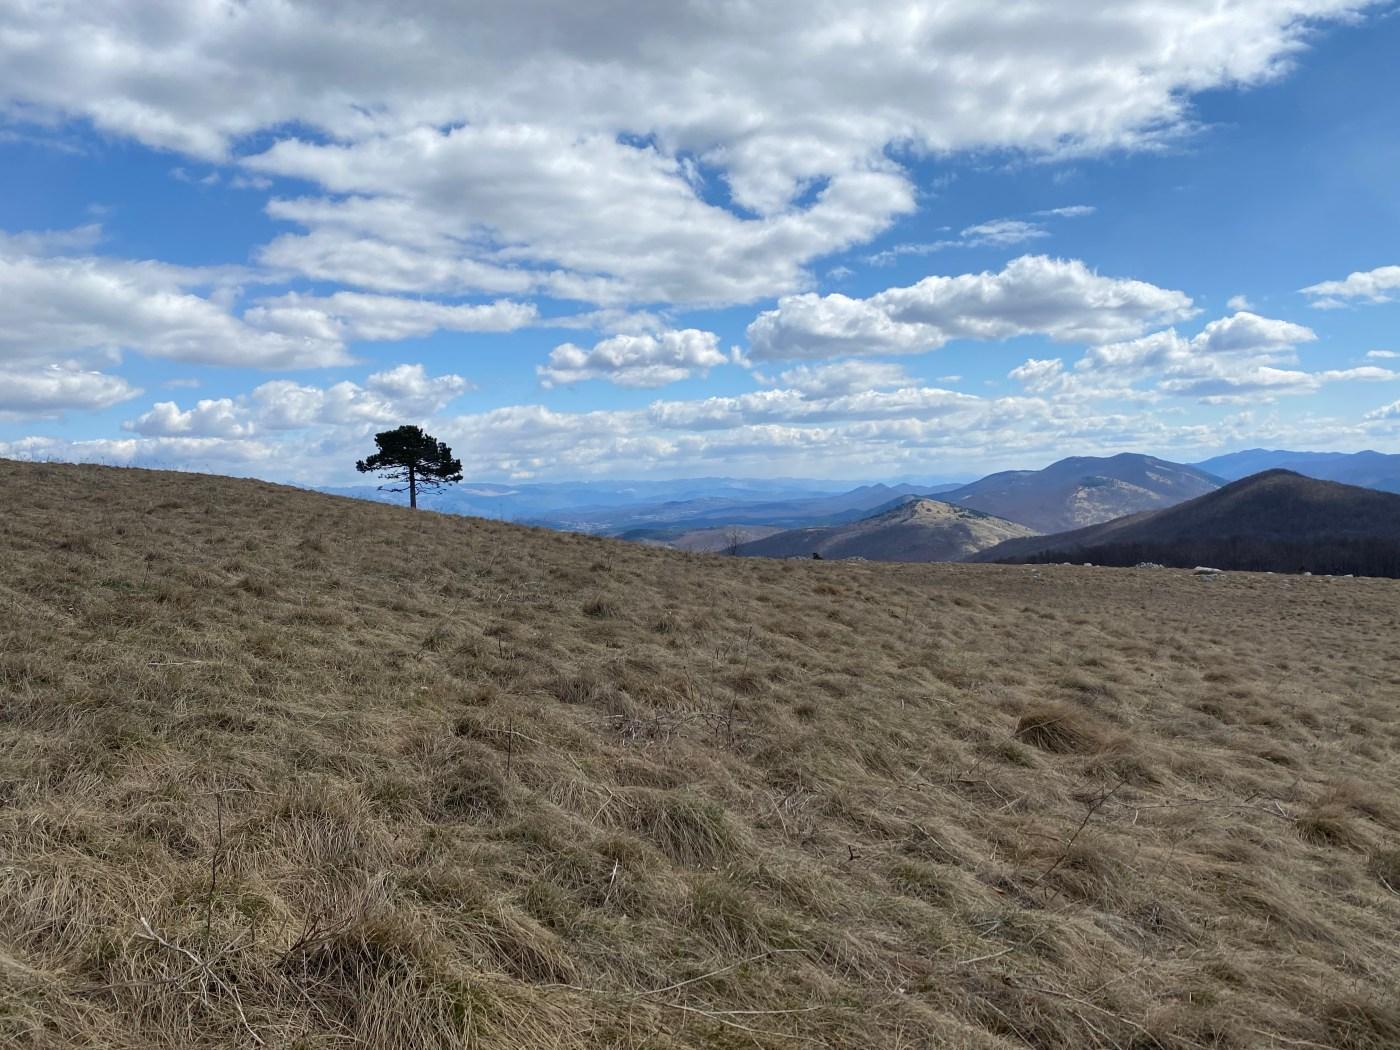 Lone tree on mountainside